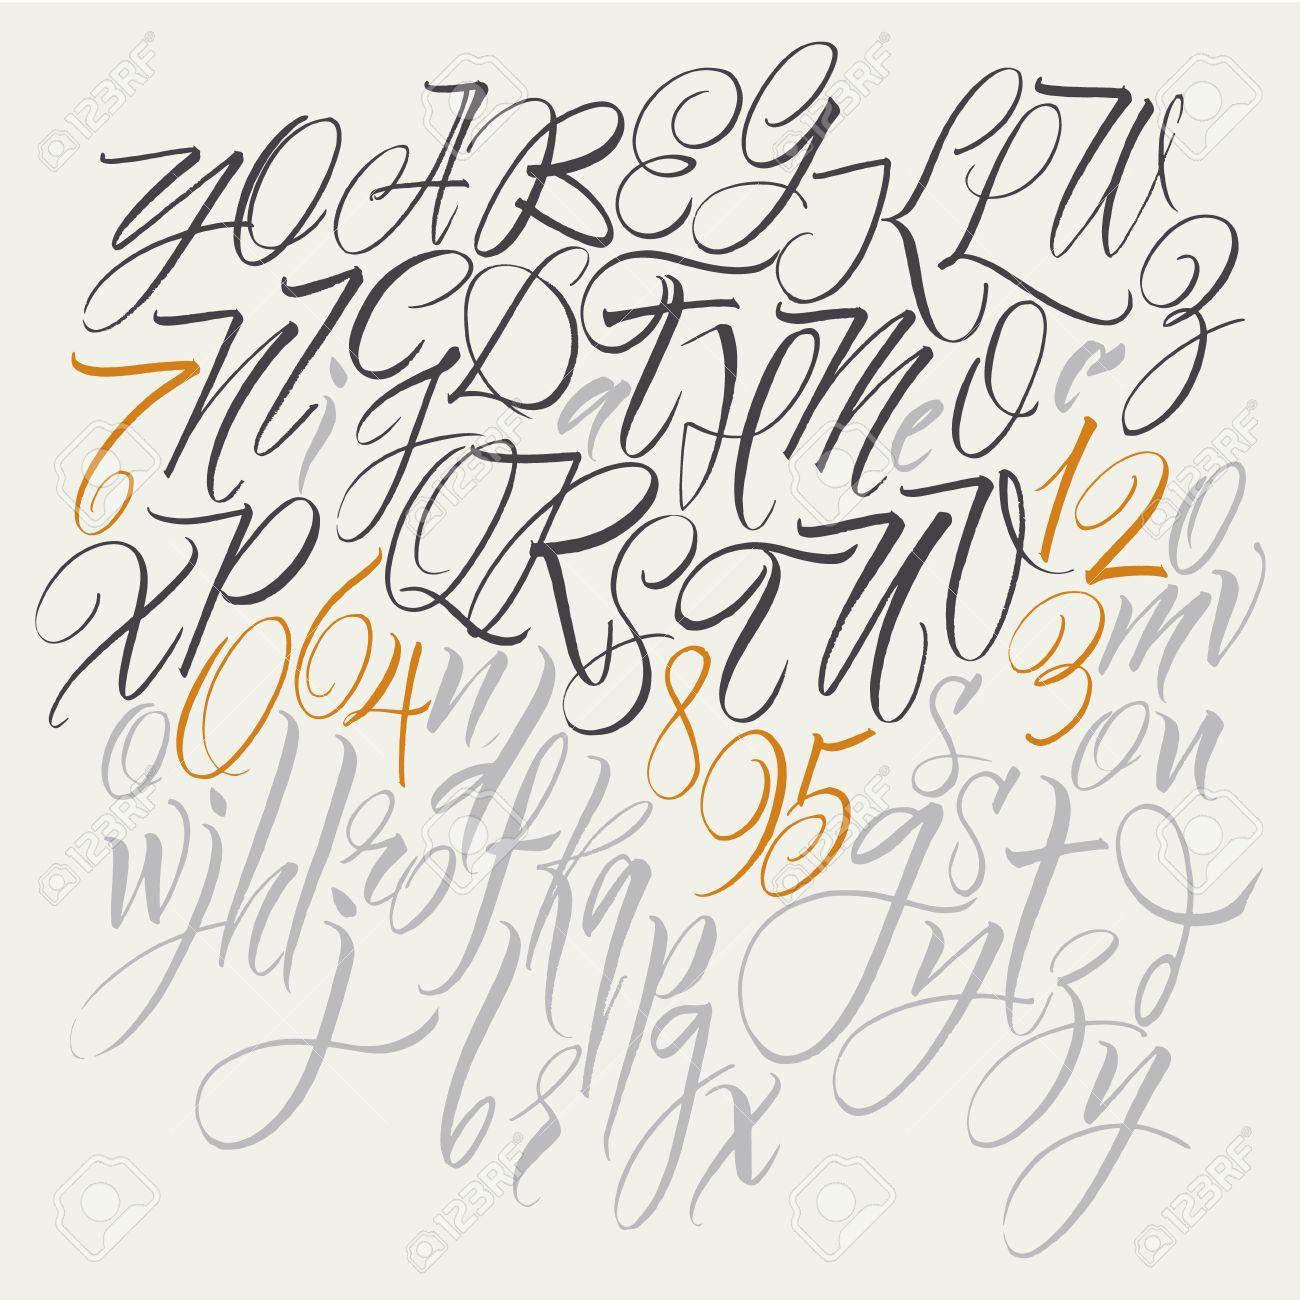 Connu Differente Ecriture Pour Tatouage - Galerie Tatouage WX15